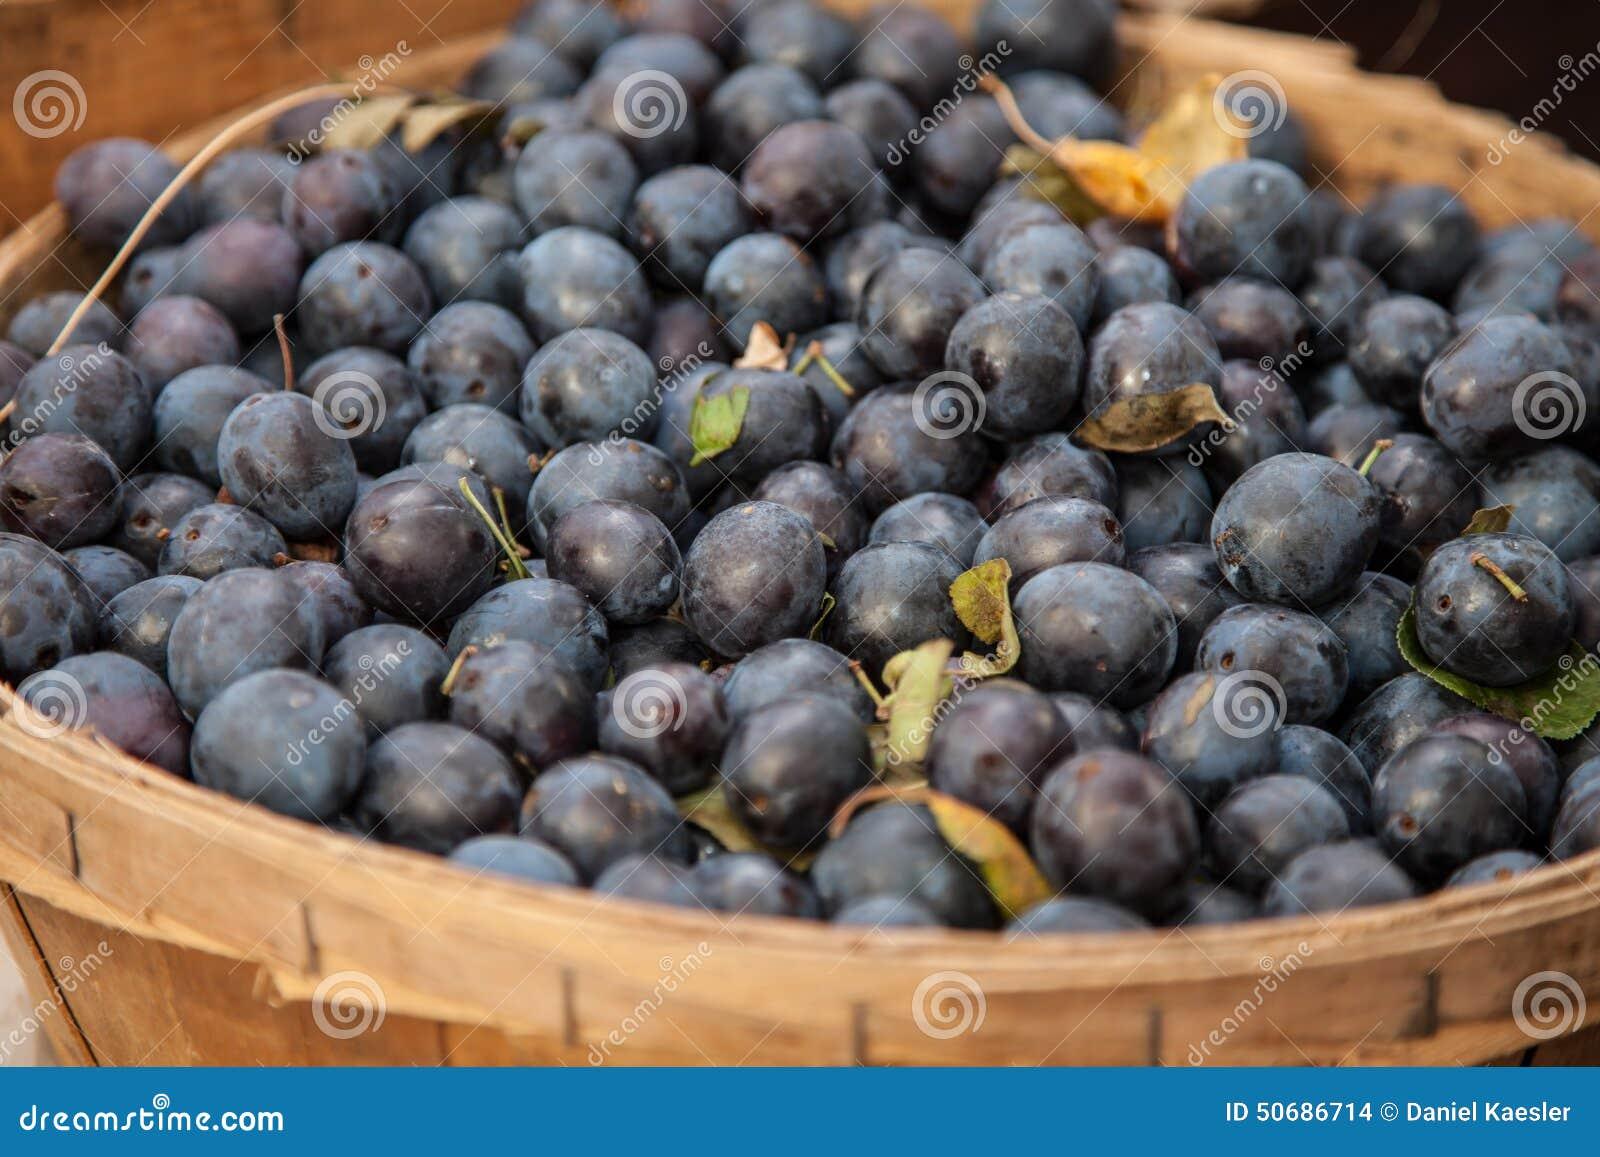 Download 蓝莓 库存照片. 图片 包括有 蓝莓, 有机, berrying, 收获, 食物, 维生素, 类似, 庄稼 - 50686714